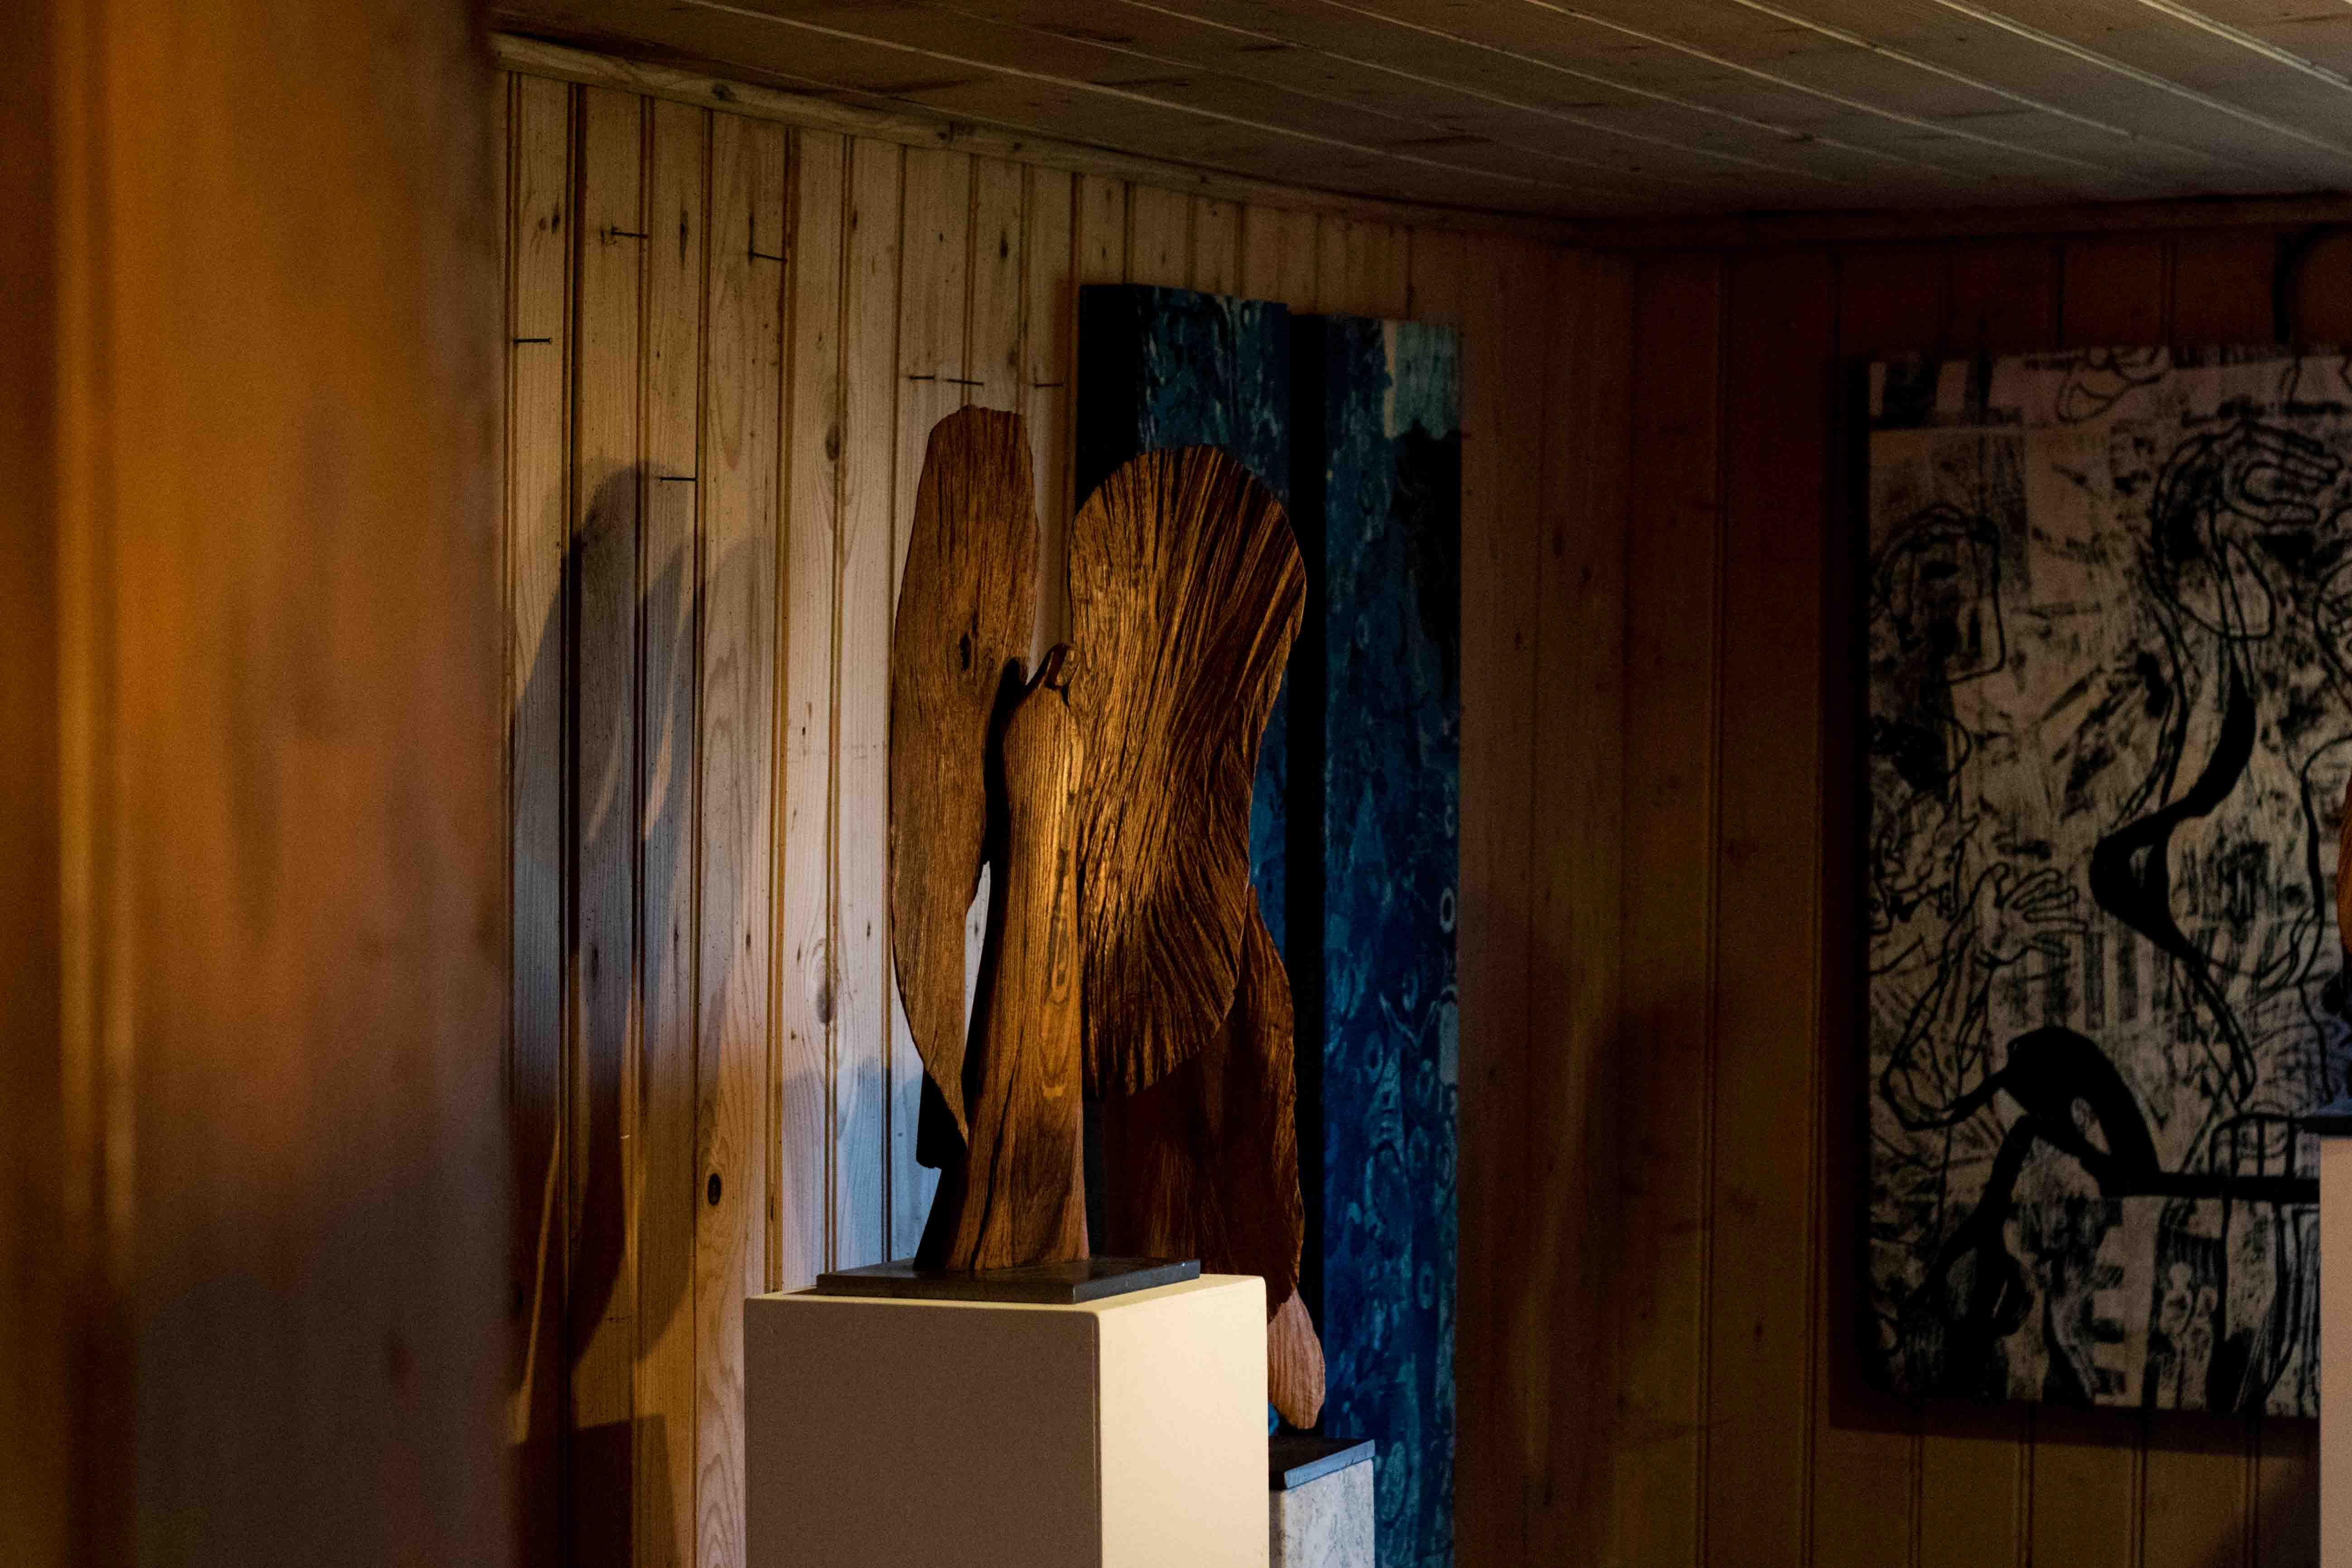 Giorgio offenes Atelier 2018-20